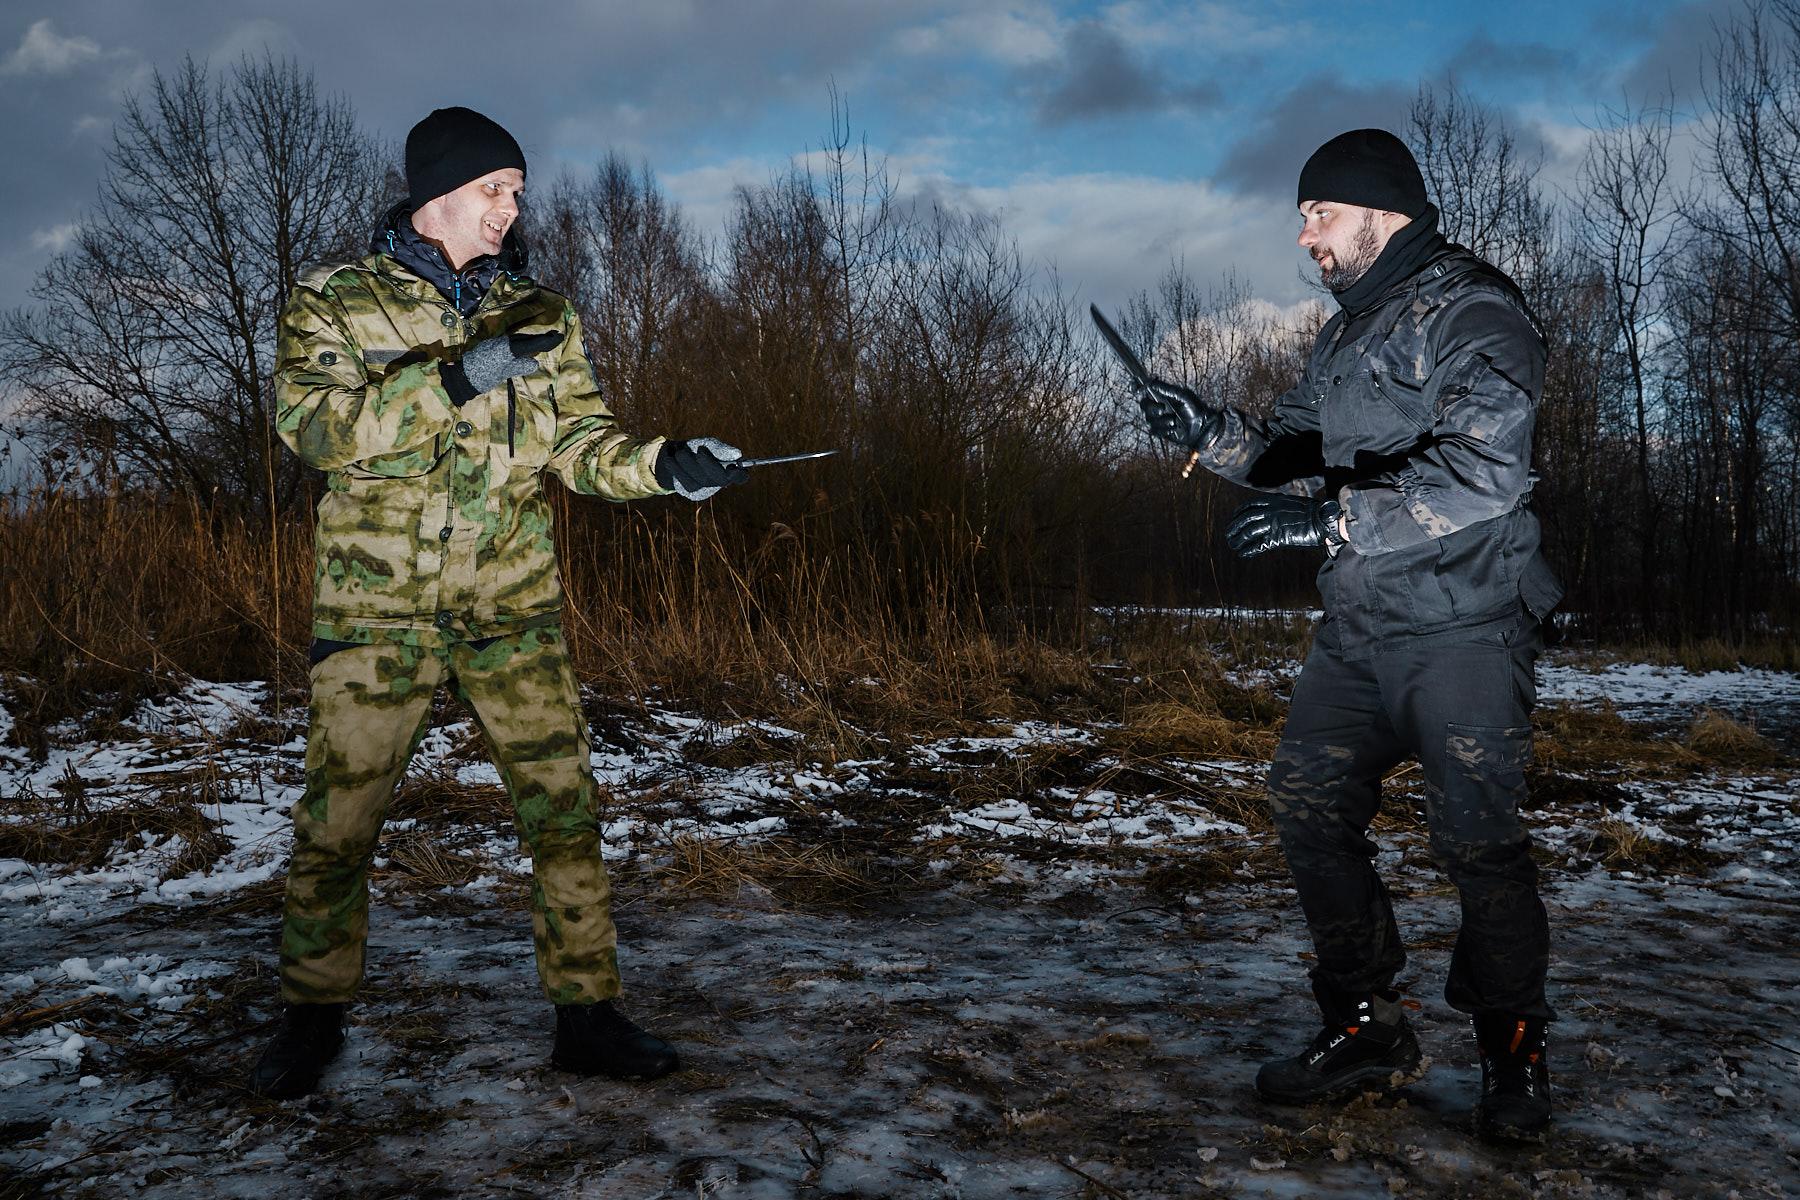 Как скинхед изБратеево русским националистом стал, арусский национализм взял ипомер